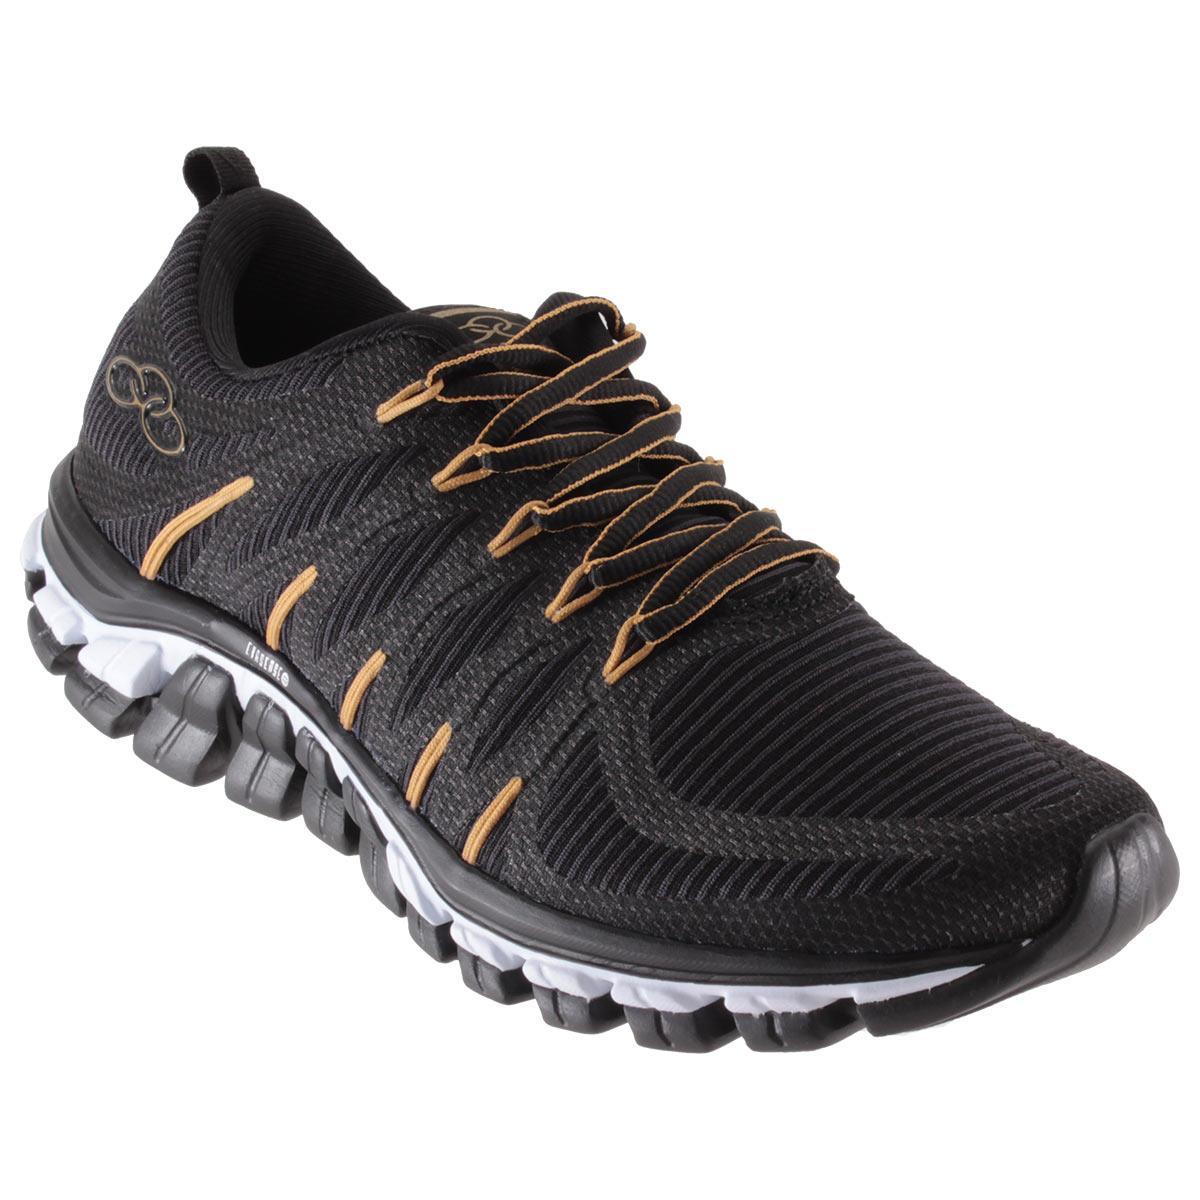 Tênis Olympikus Style Masculino Caminhada Corrida Lindo 298